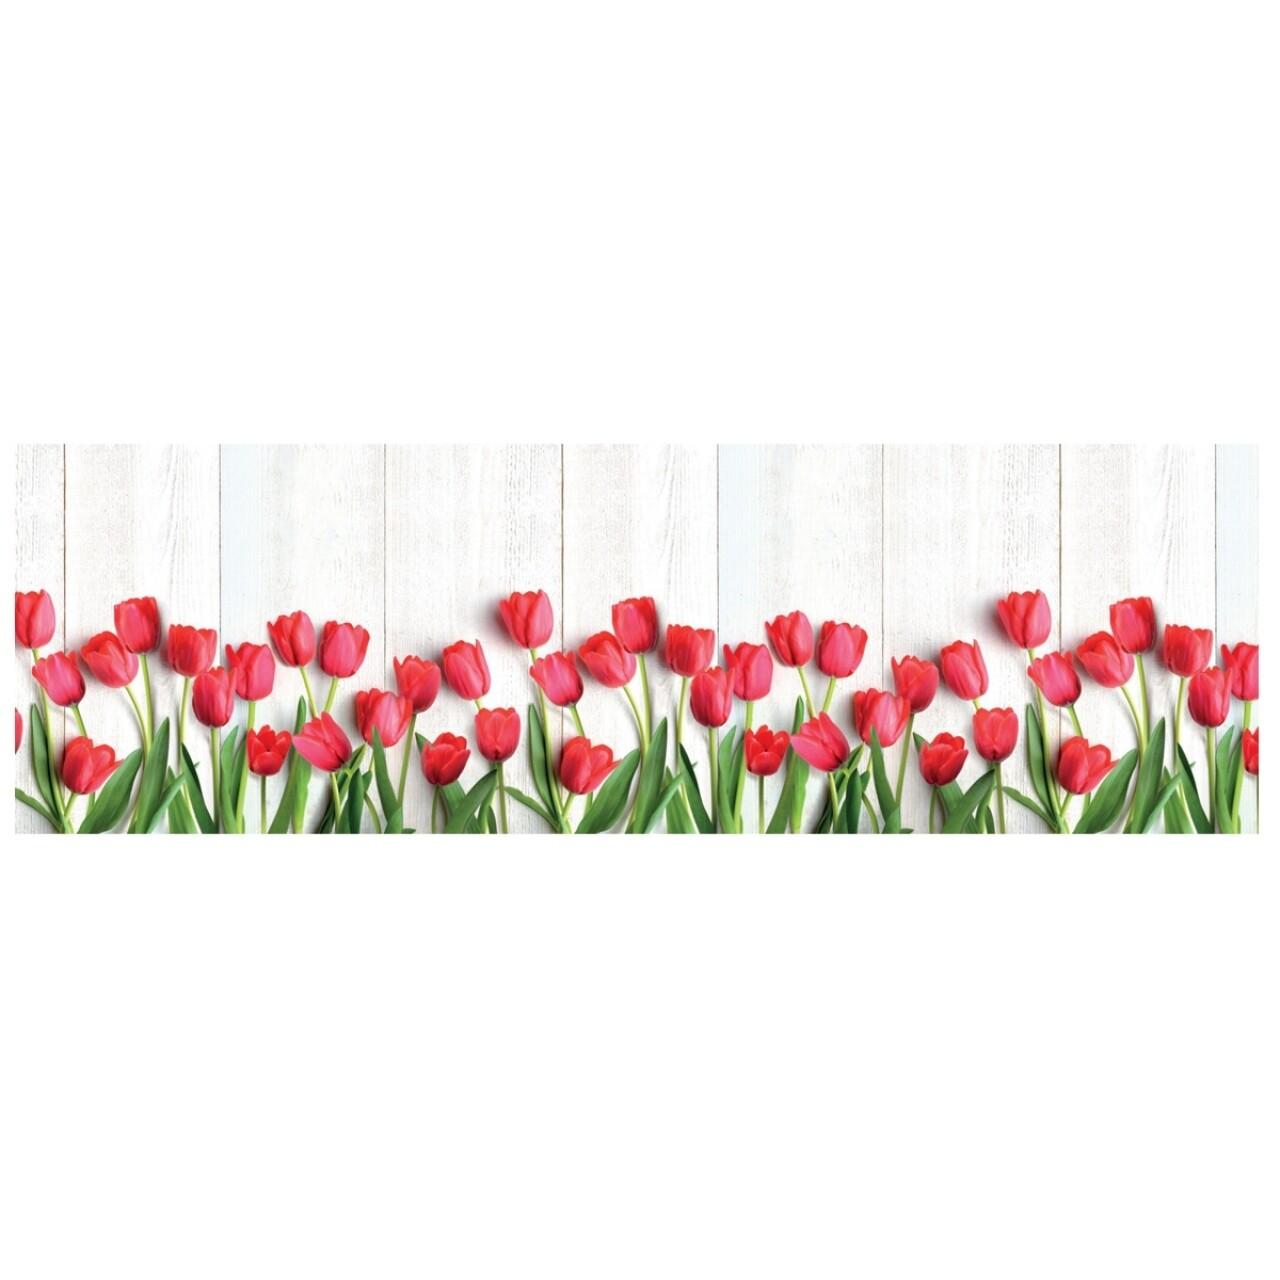 Covor rezistent Webtappeti Tulipani 58 x 240 cm, alb/verde/rosu